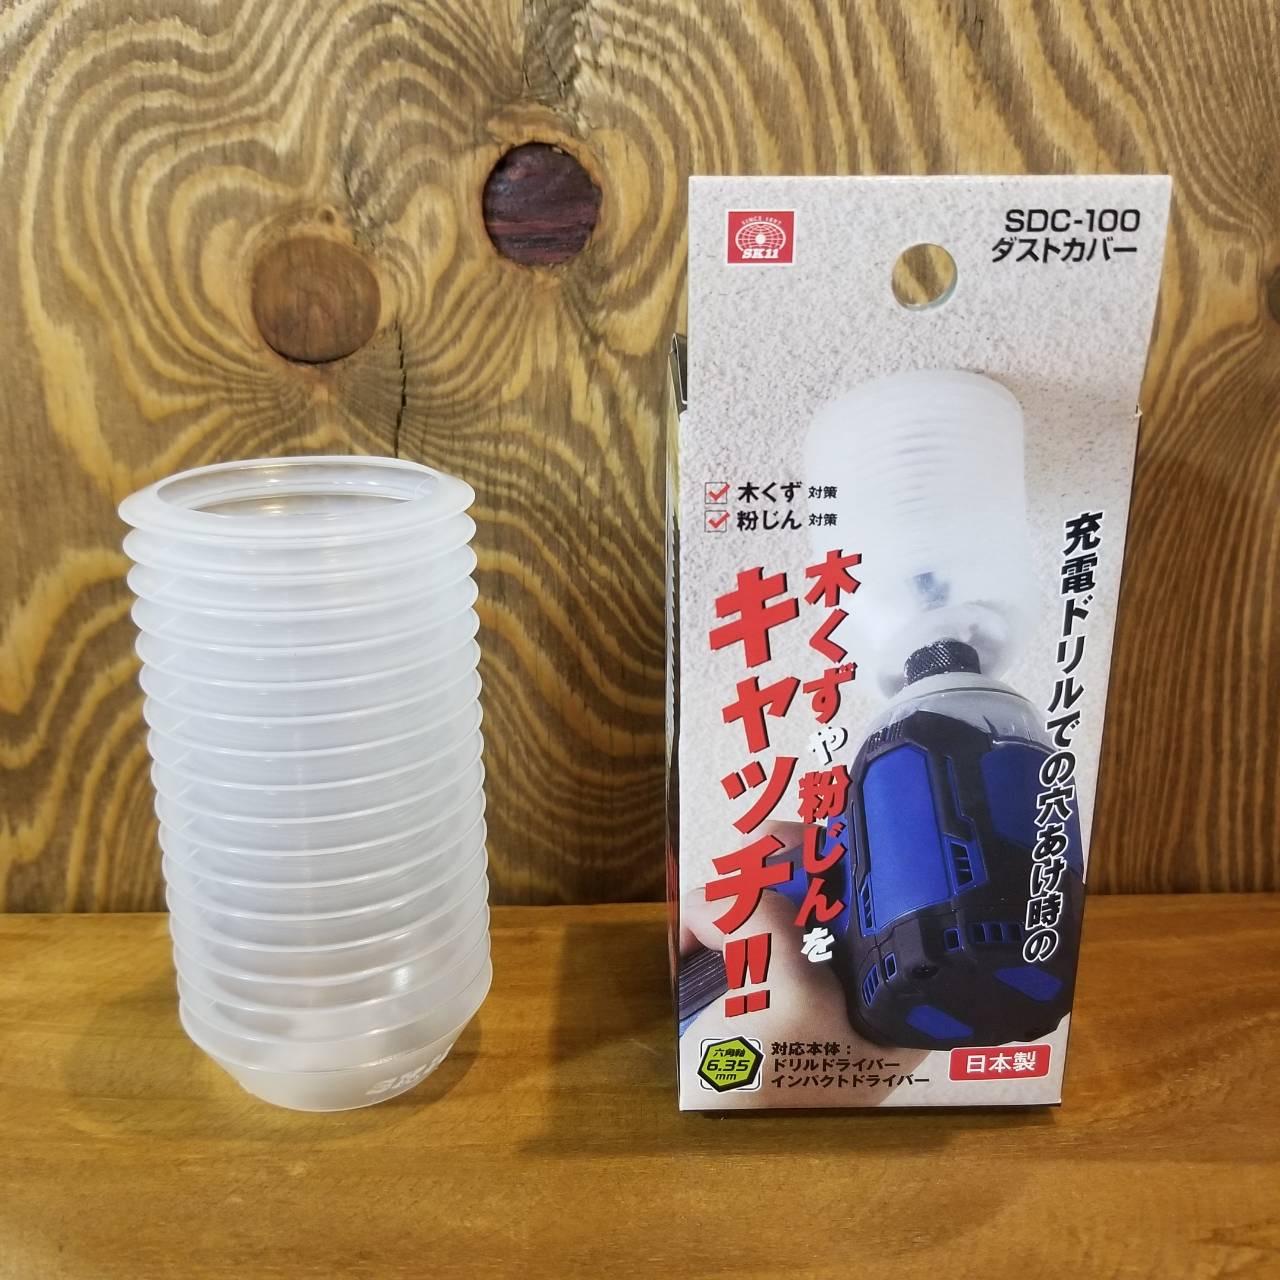 SK11 ダストカバー 粉塵・木くず用 SDC-100